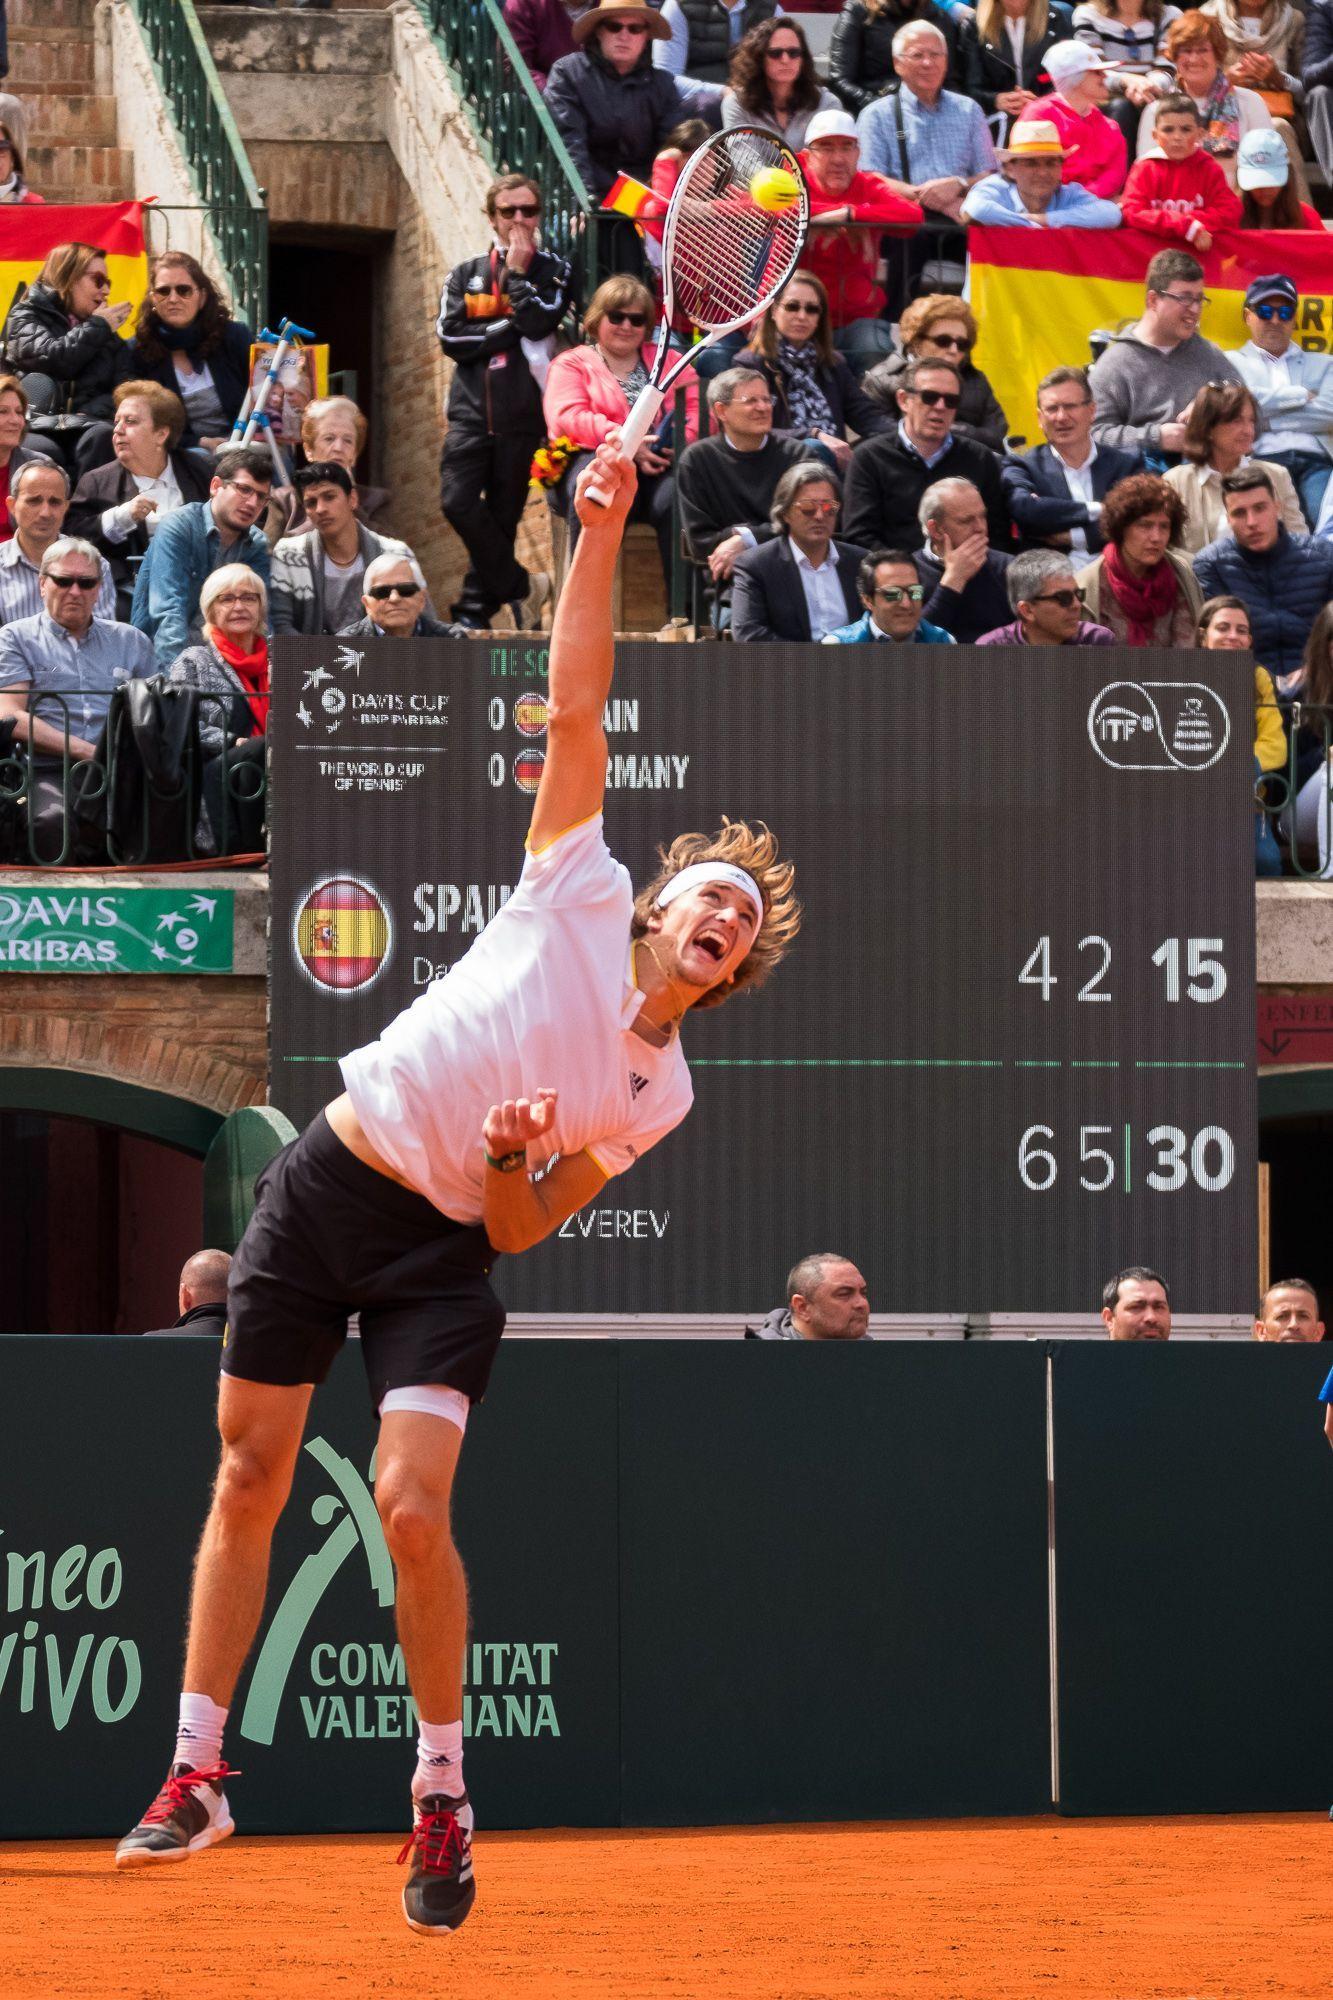 Copa Davis por BNP Paribas 2018, Alexander Zverev